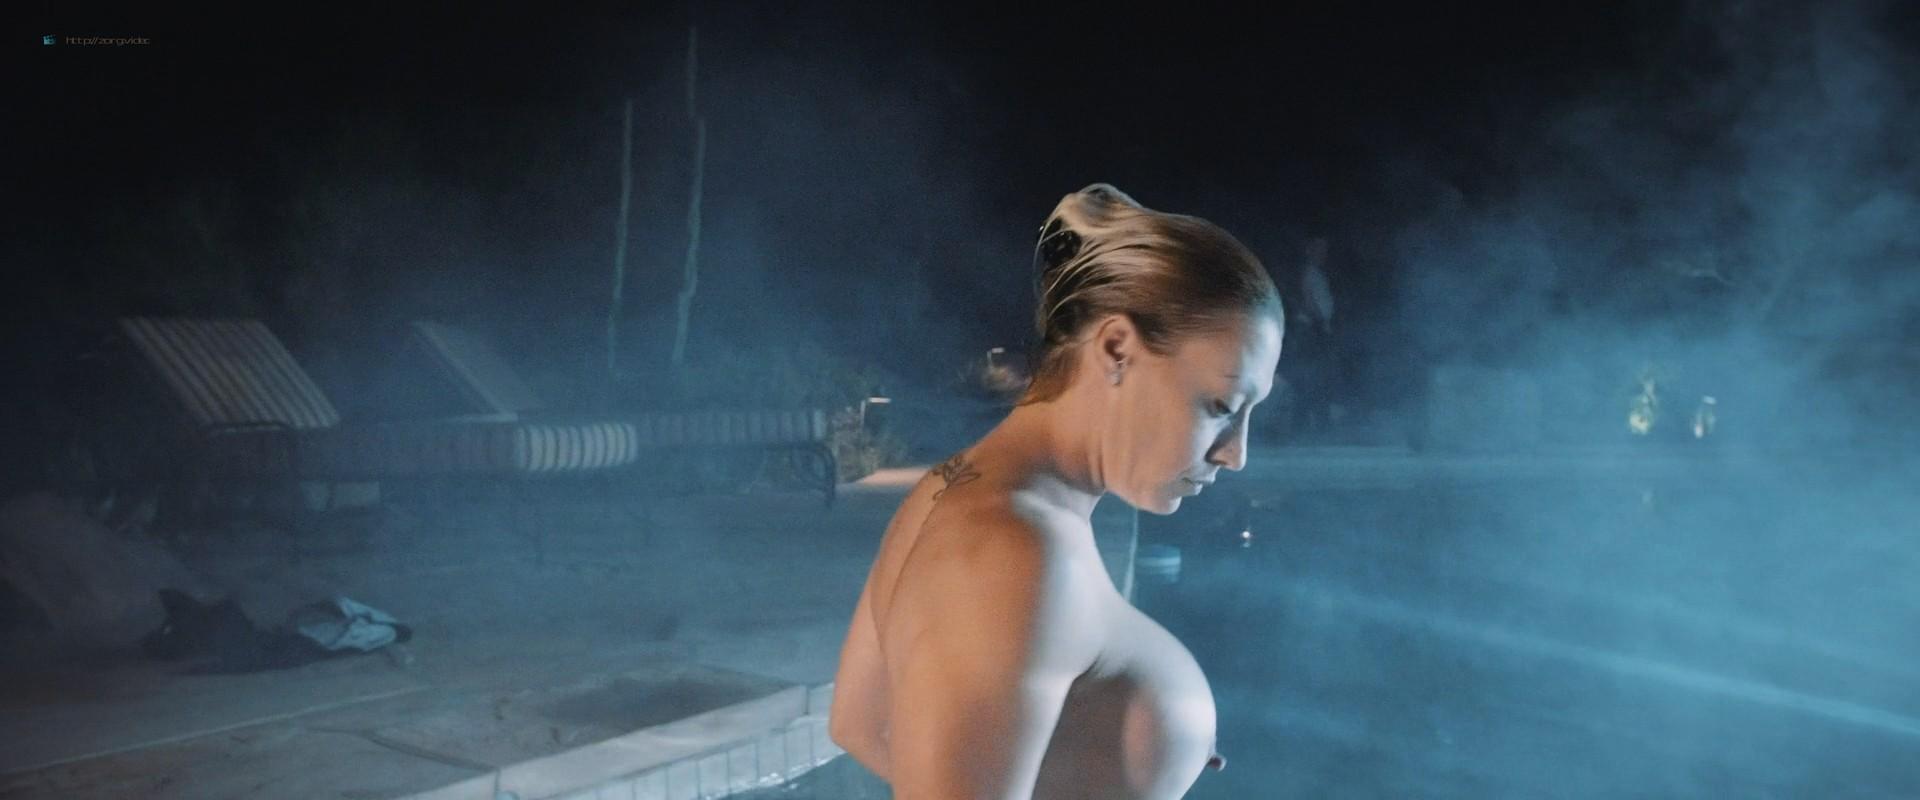 Audrey Beth nude topless Kier Simonetta, Michelle Miller nude too - Water (2019) 1080p (2)